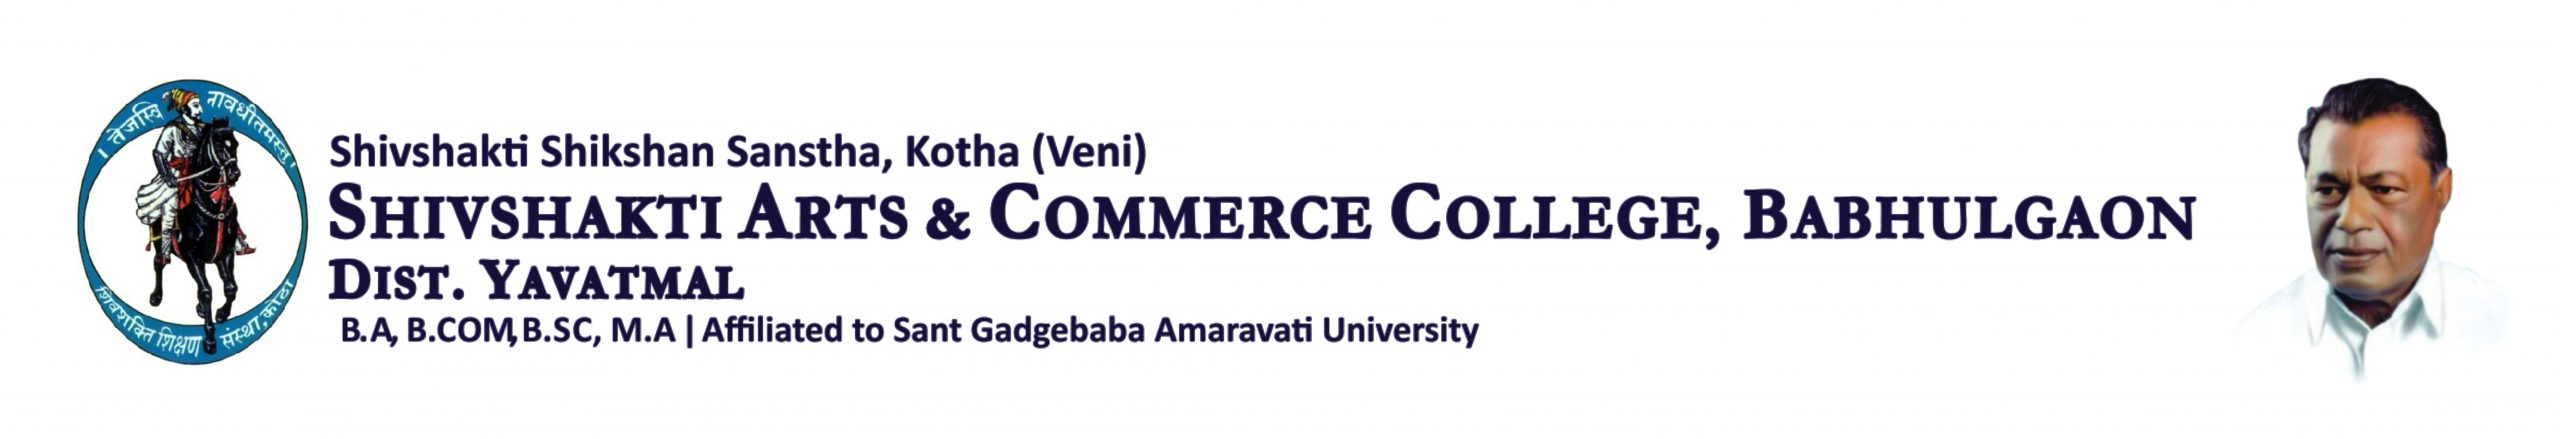 Shivshakti College Of Art and Science